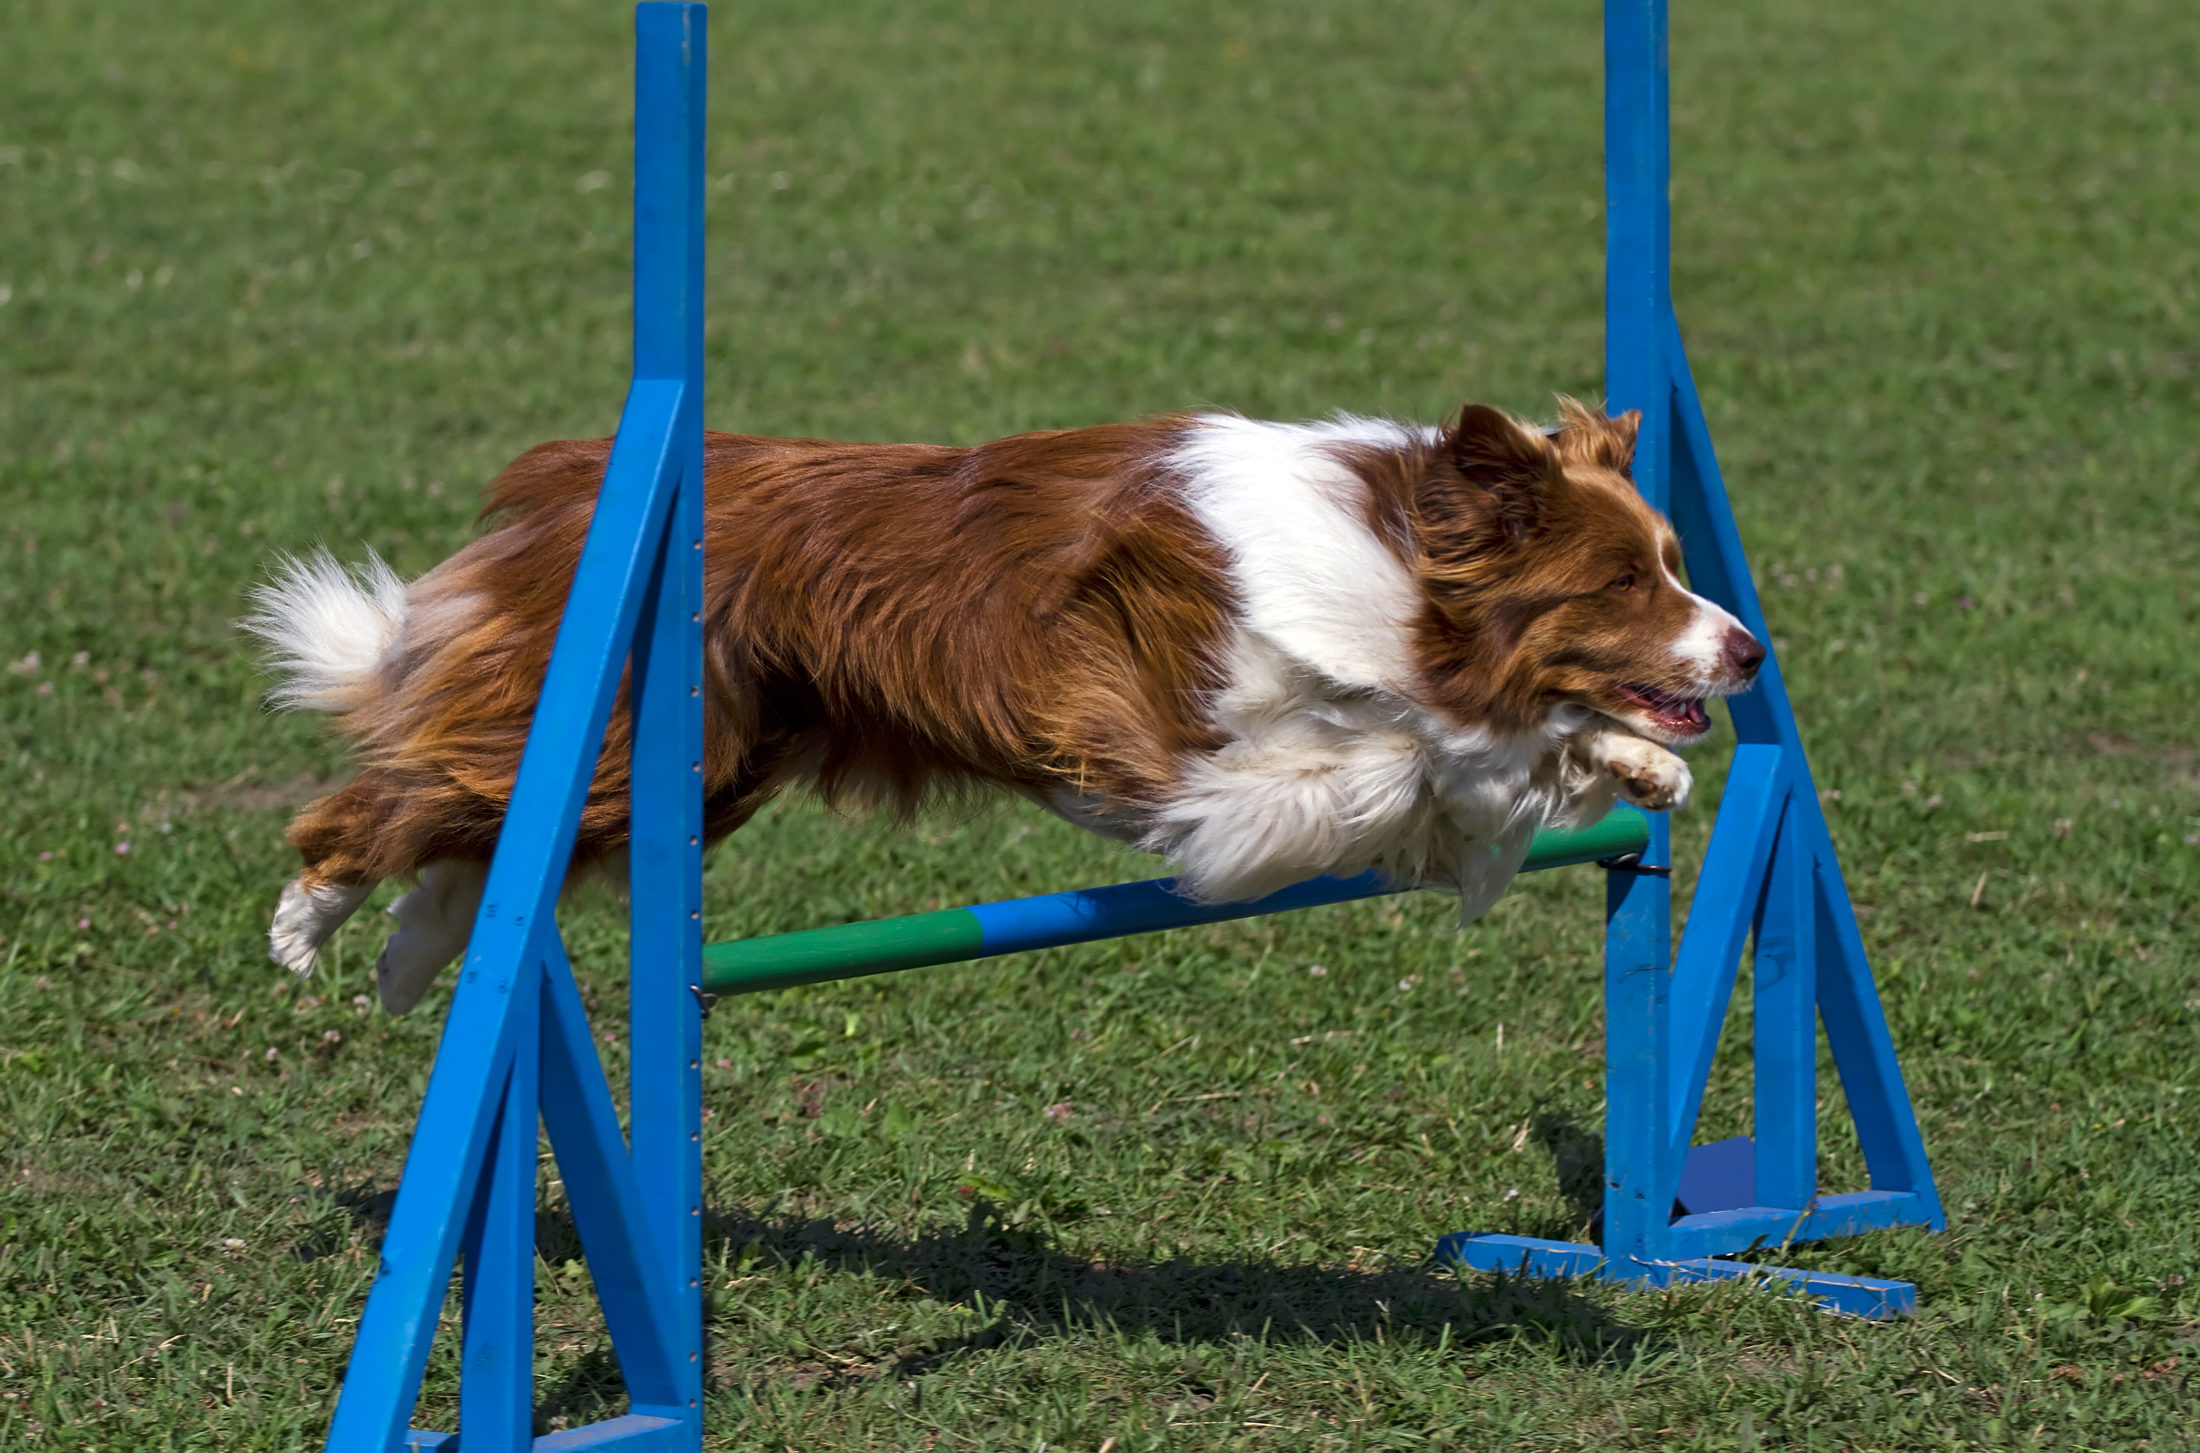 border collie saltando obstáculo emt reinamento de agilidade.